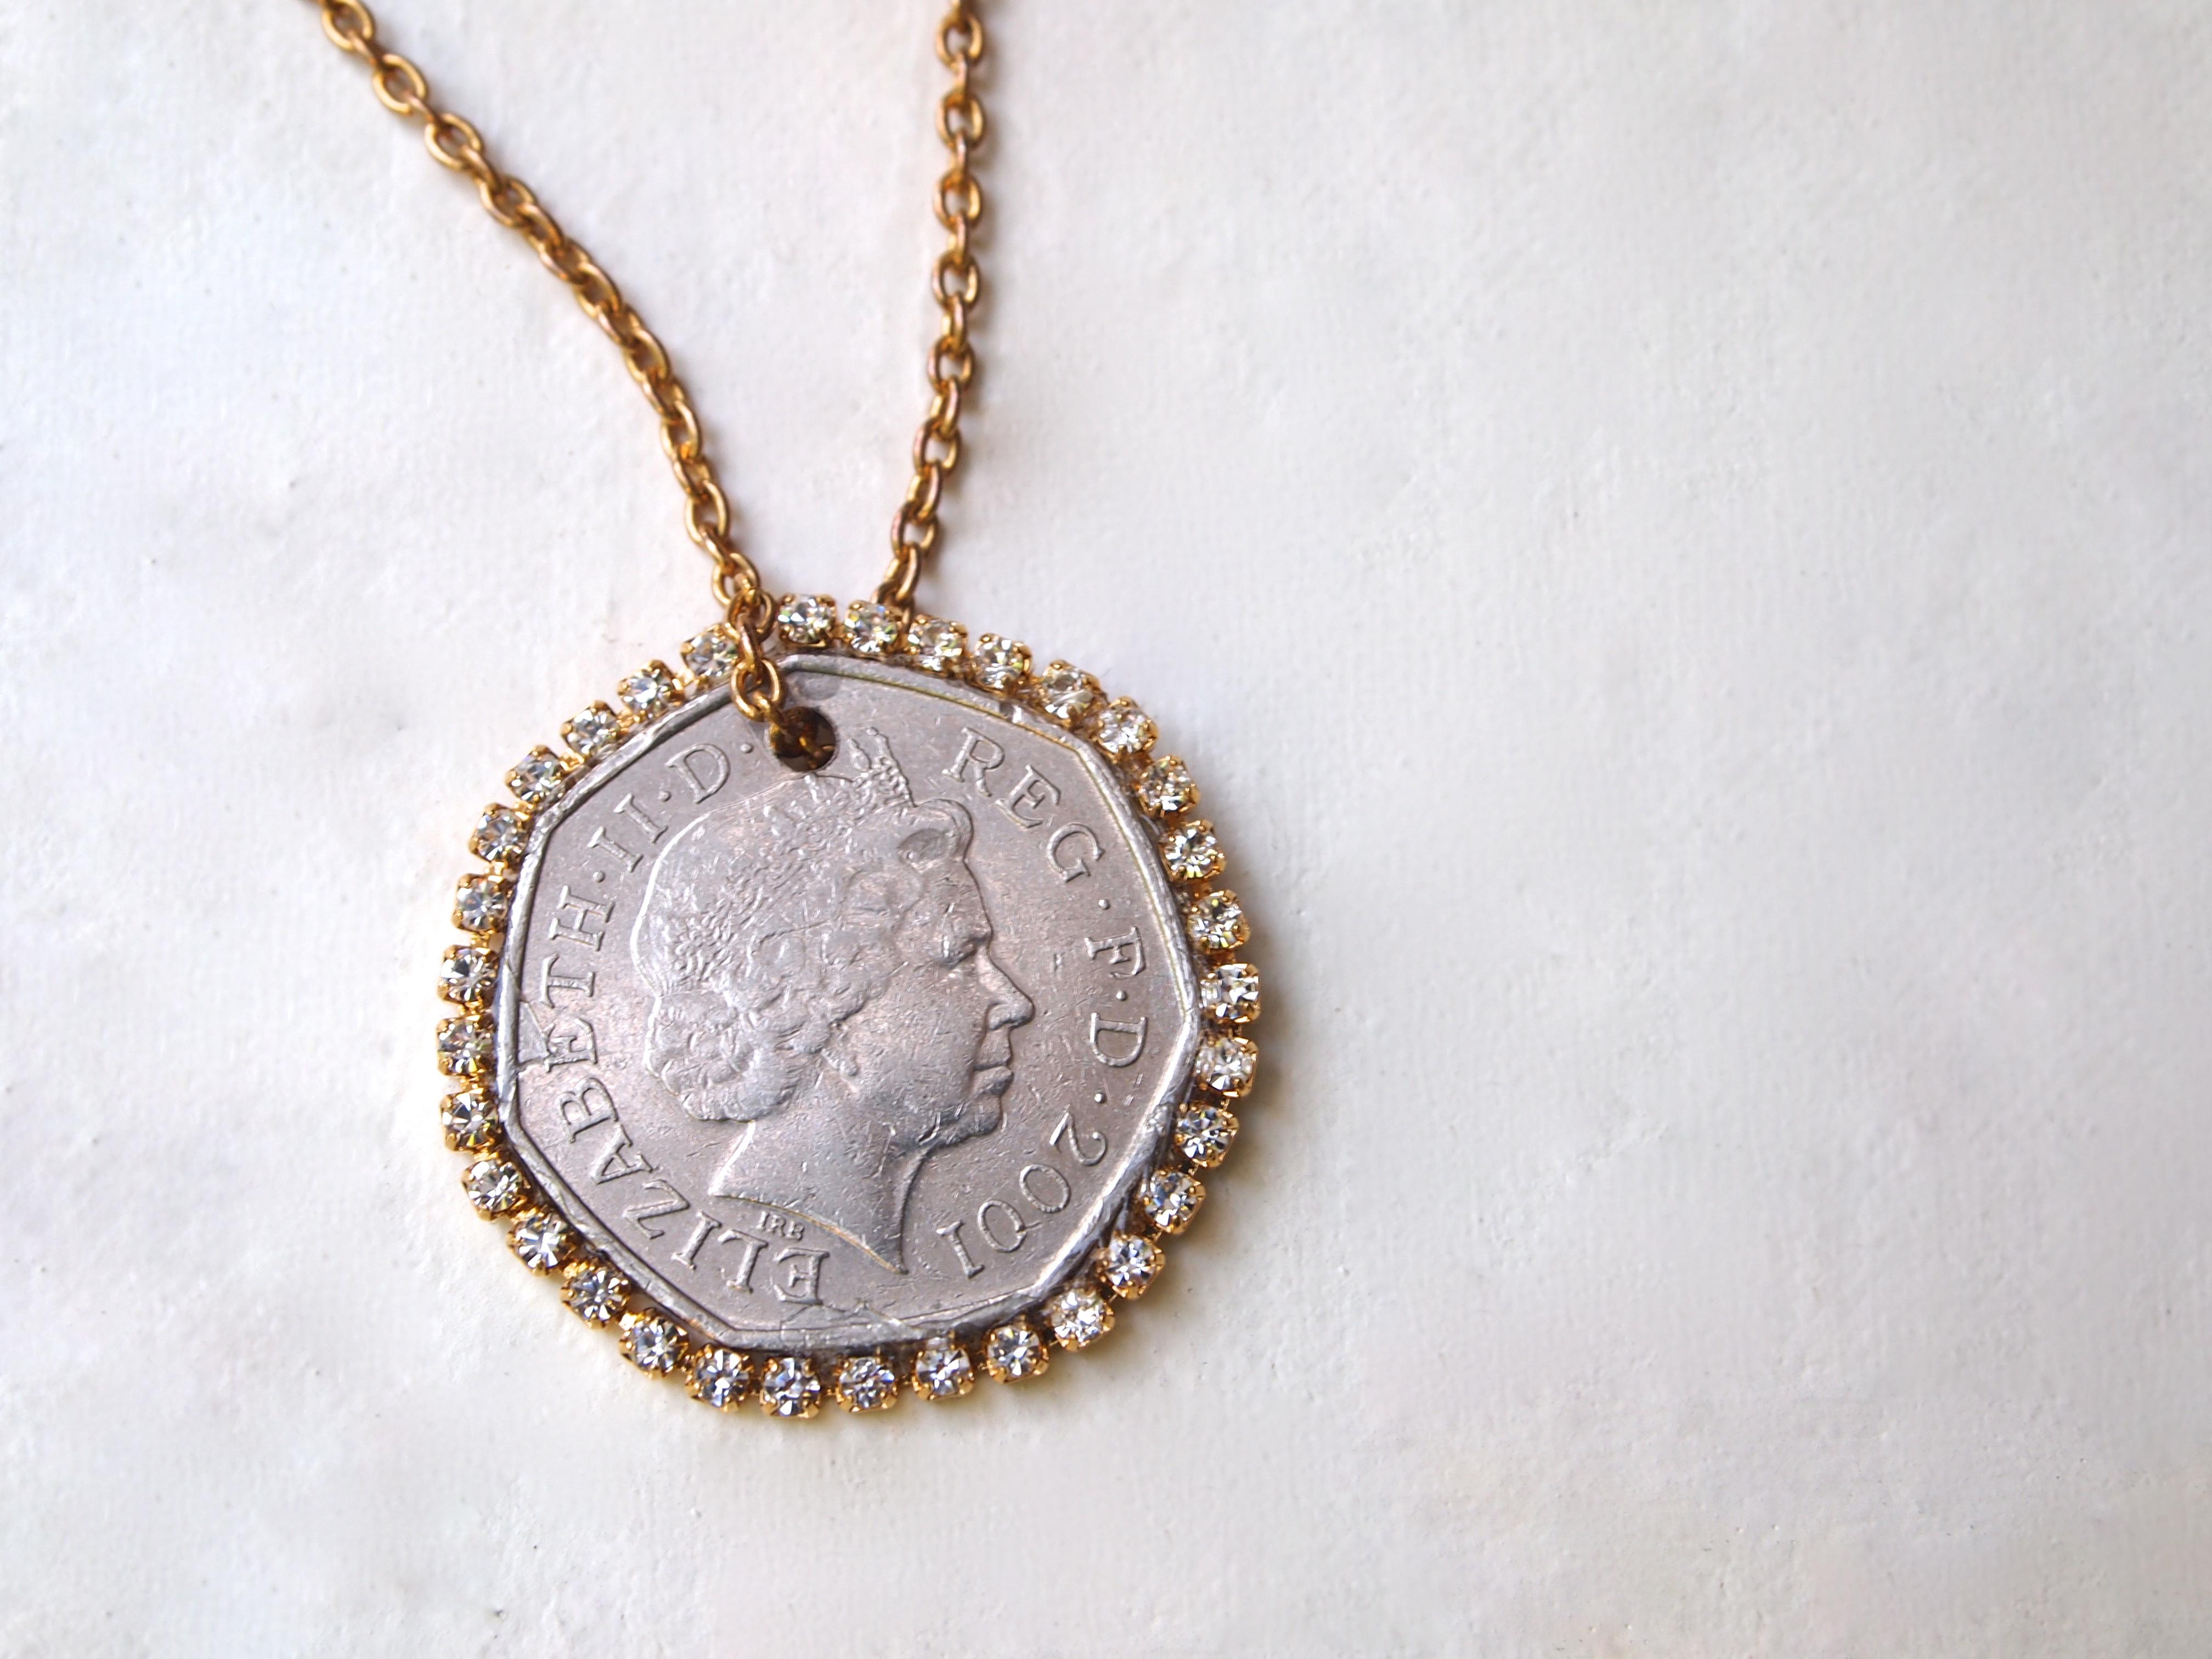 Diy coin n rhinestone pendant necklace diy coin n rhinestone pendant necklace aloadofball Gallery